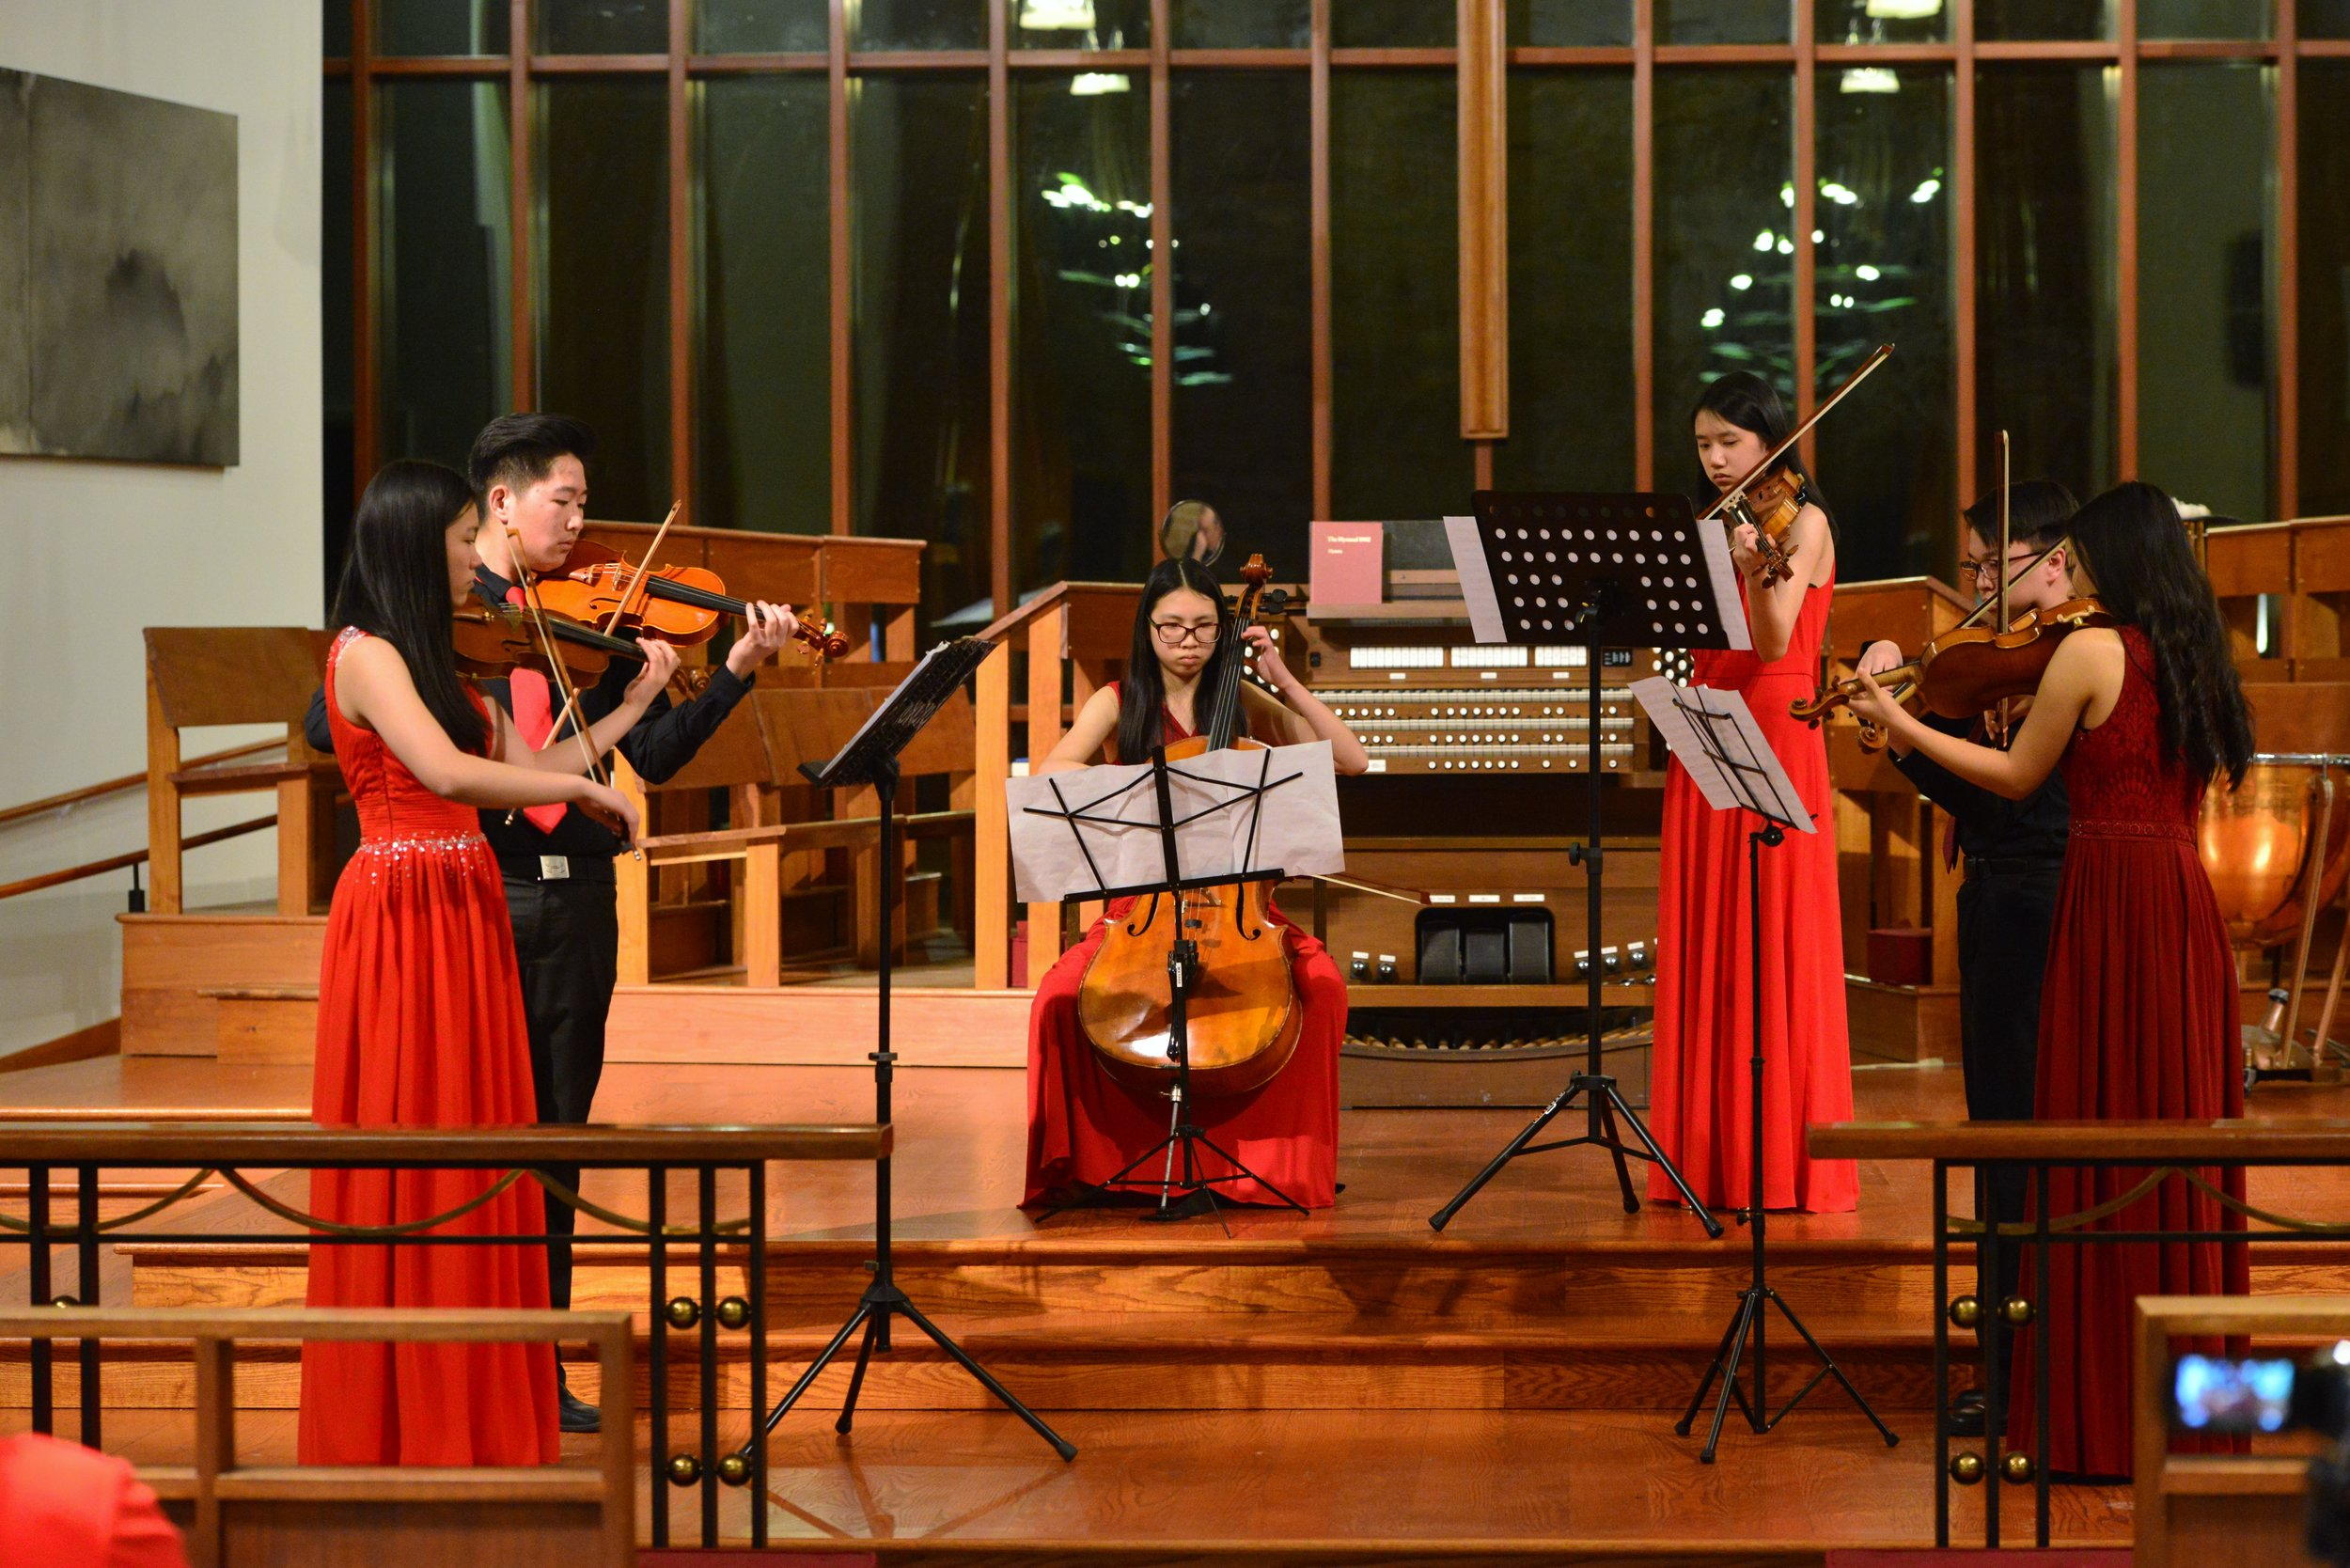 Beethoven Strings Quartet No. 4 in C minor